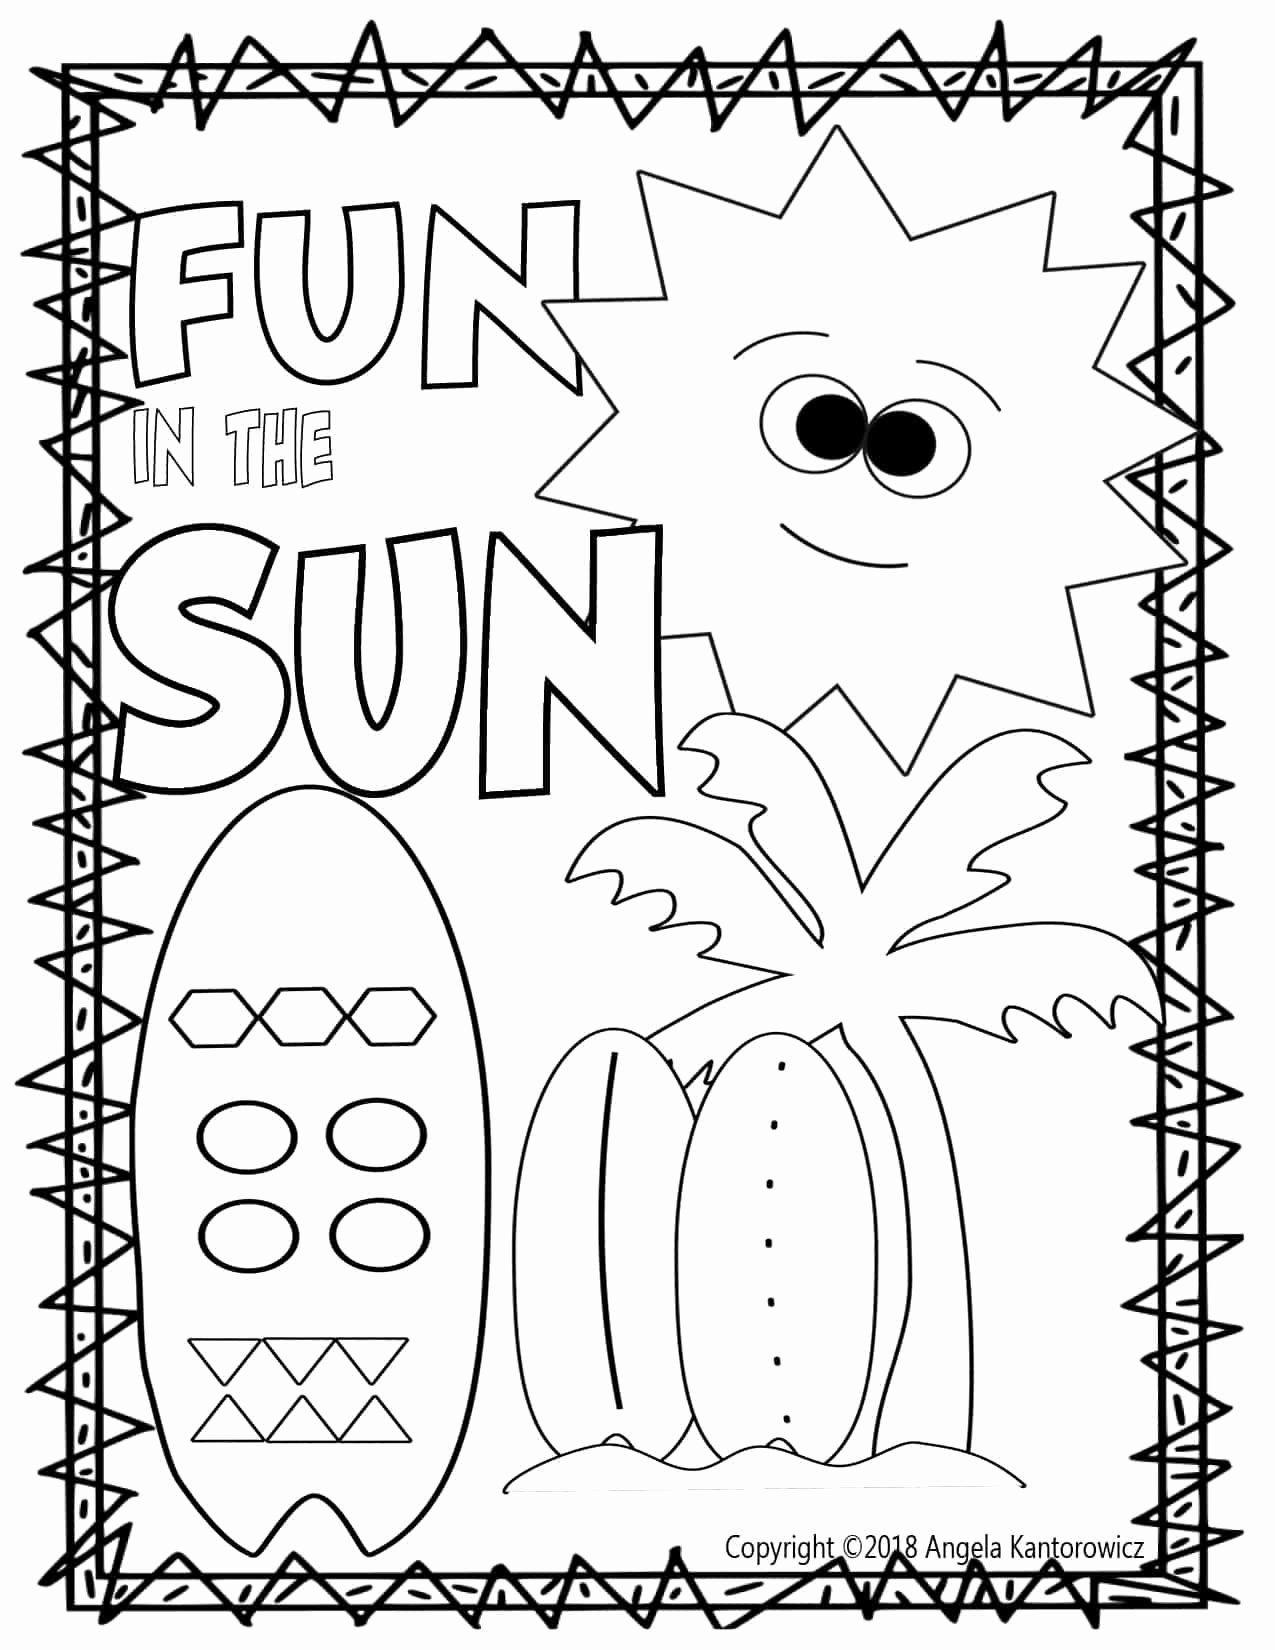 Pin On Worksheets For Preschoolers Ideas [ 1650 x 1275 Pixel ]